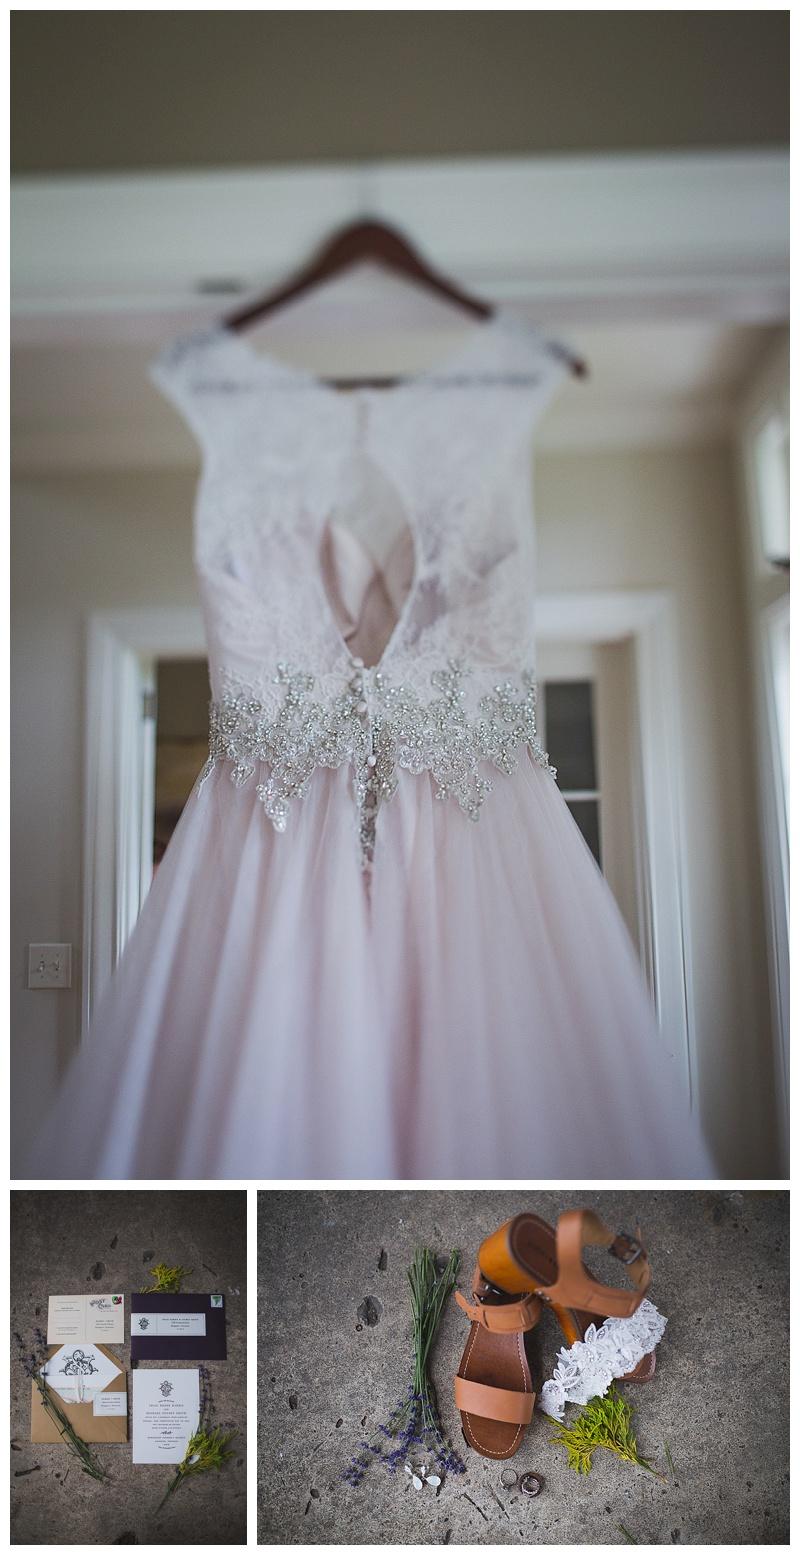 EmilyRogers-kingsport-tennesse-wedding-photographer_0006.jpg